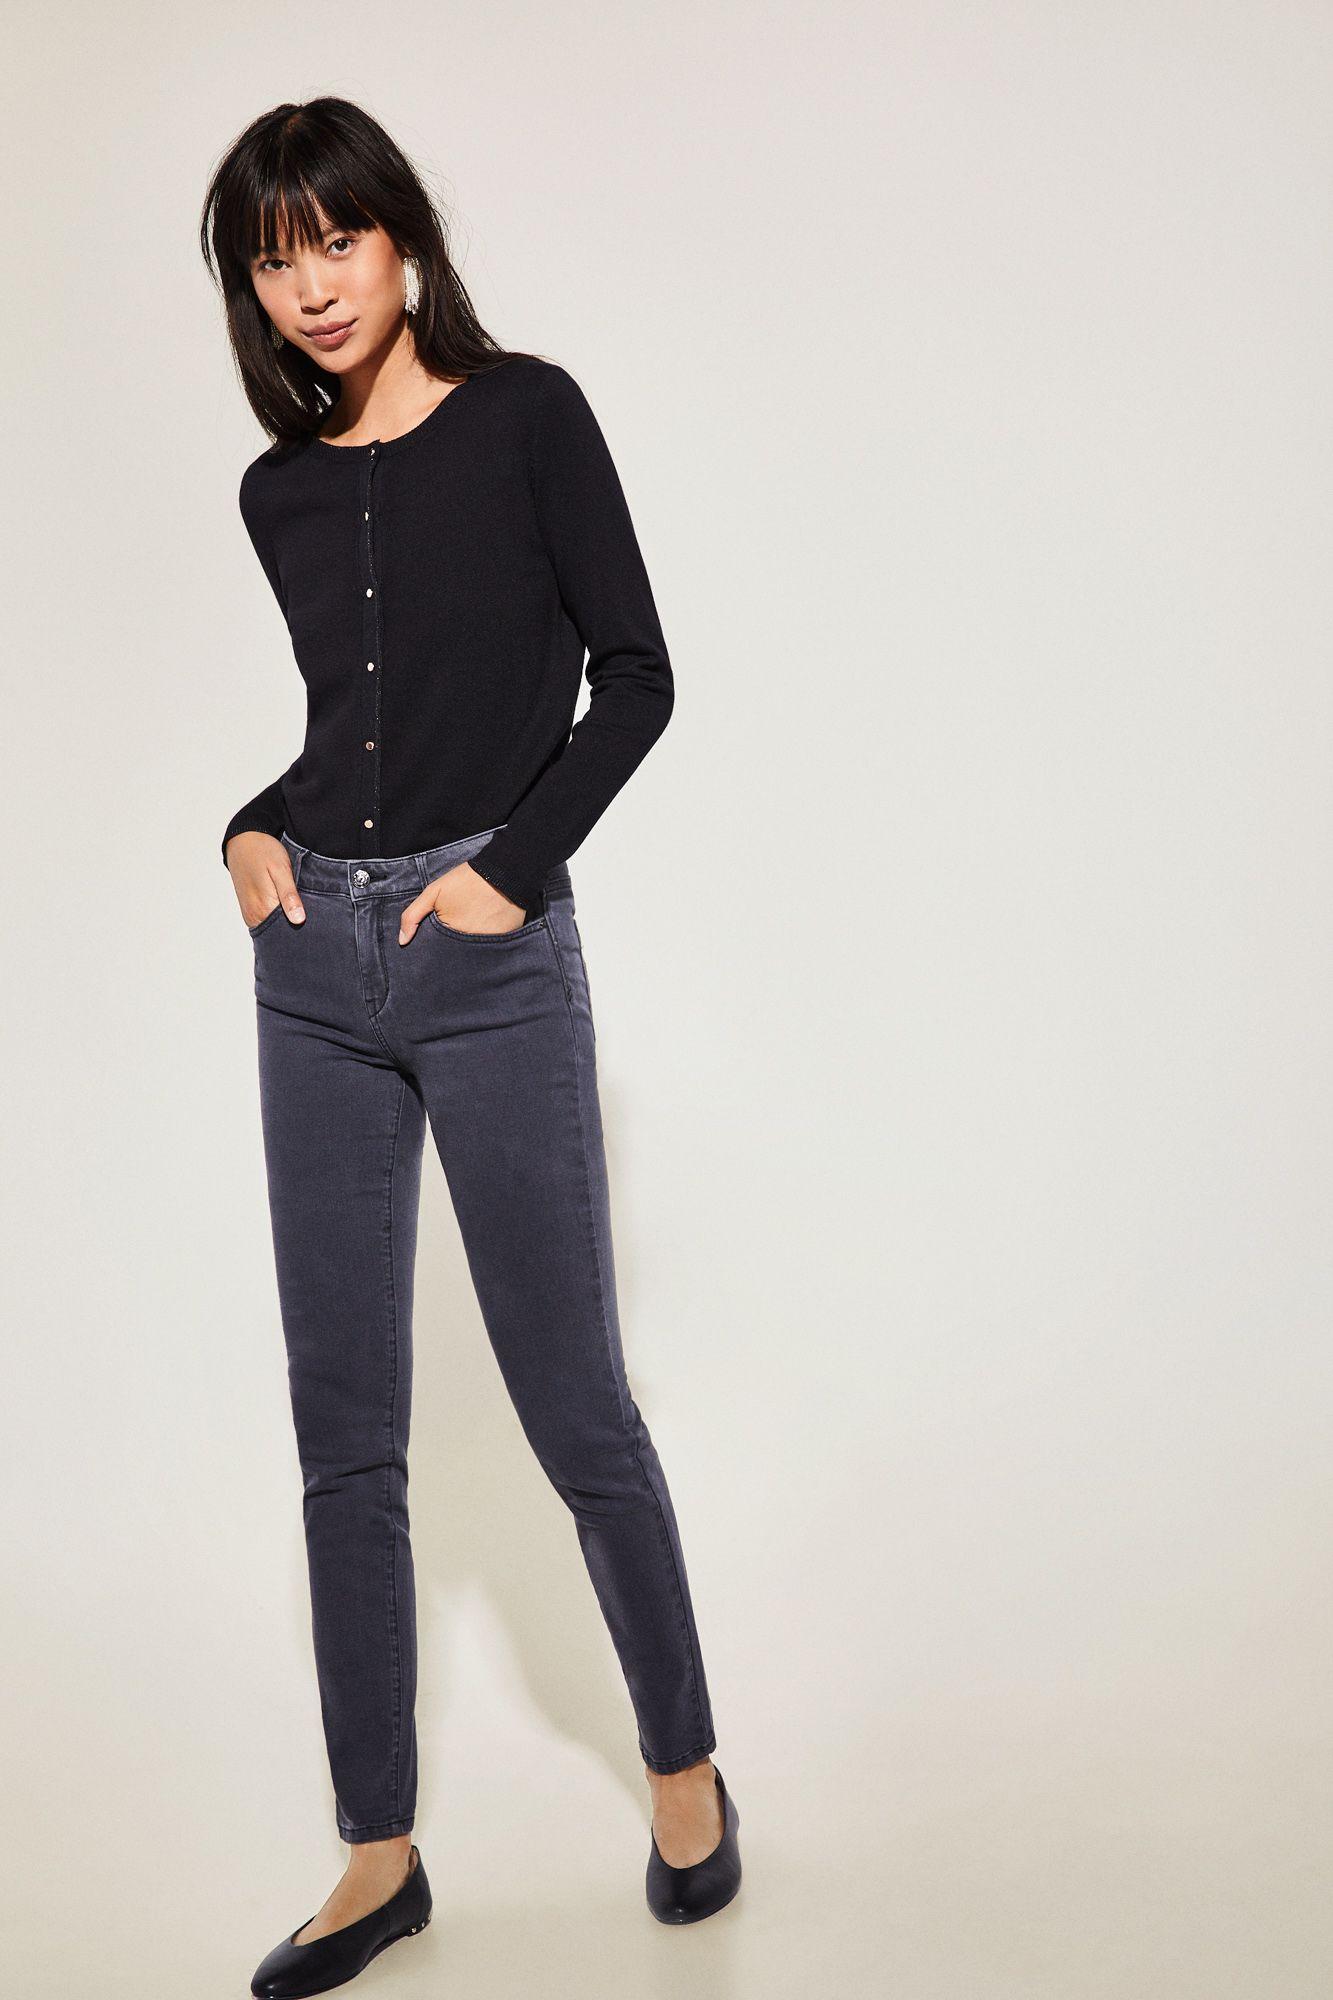 Cortefiel Jeans Pitillo Basico Ropa Ropa De Mujer Moda Para Mujer